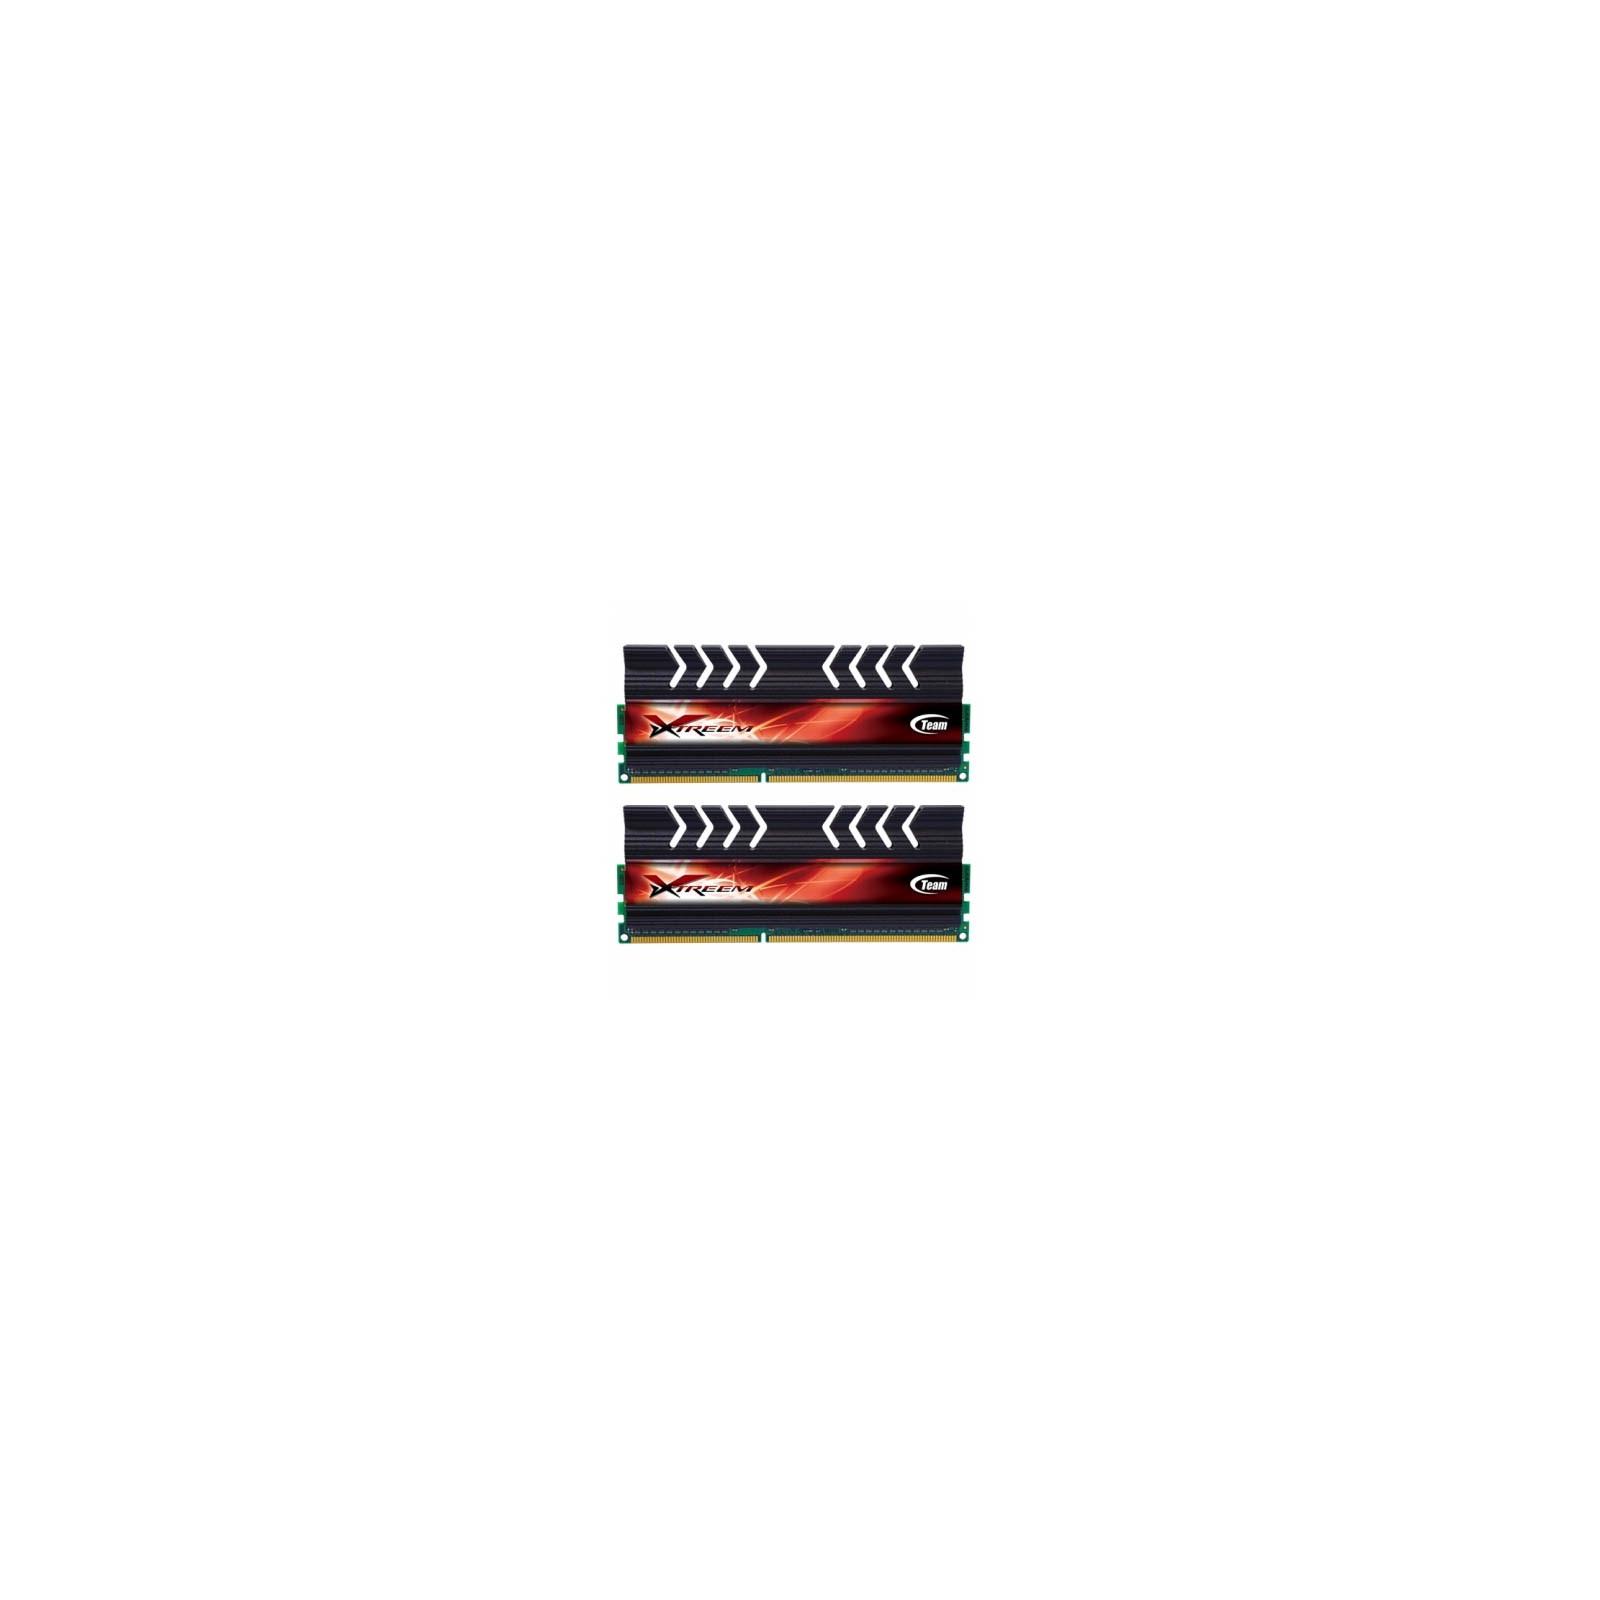 Модуль памяти для компьютера DDR3 8GB (2x4GB) 2600 MHz Team (TXD38192M2600HC10QDC-L)